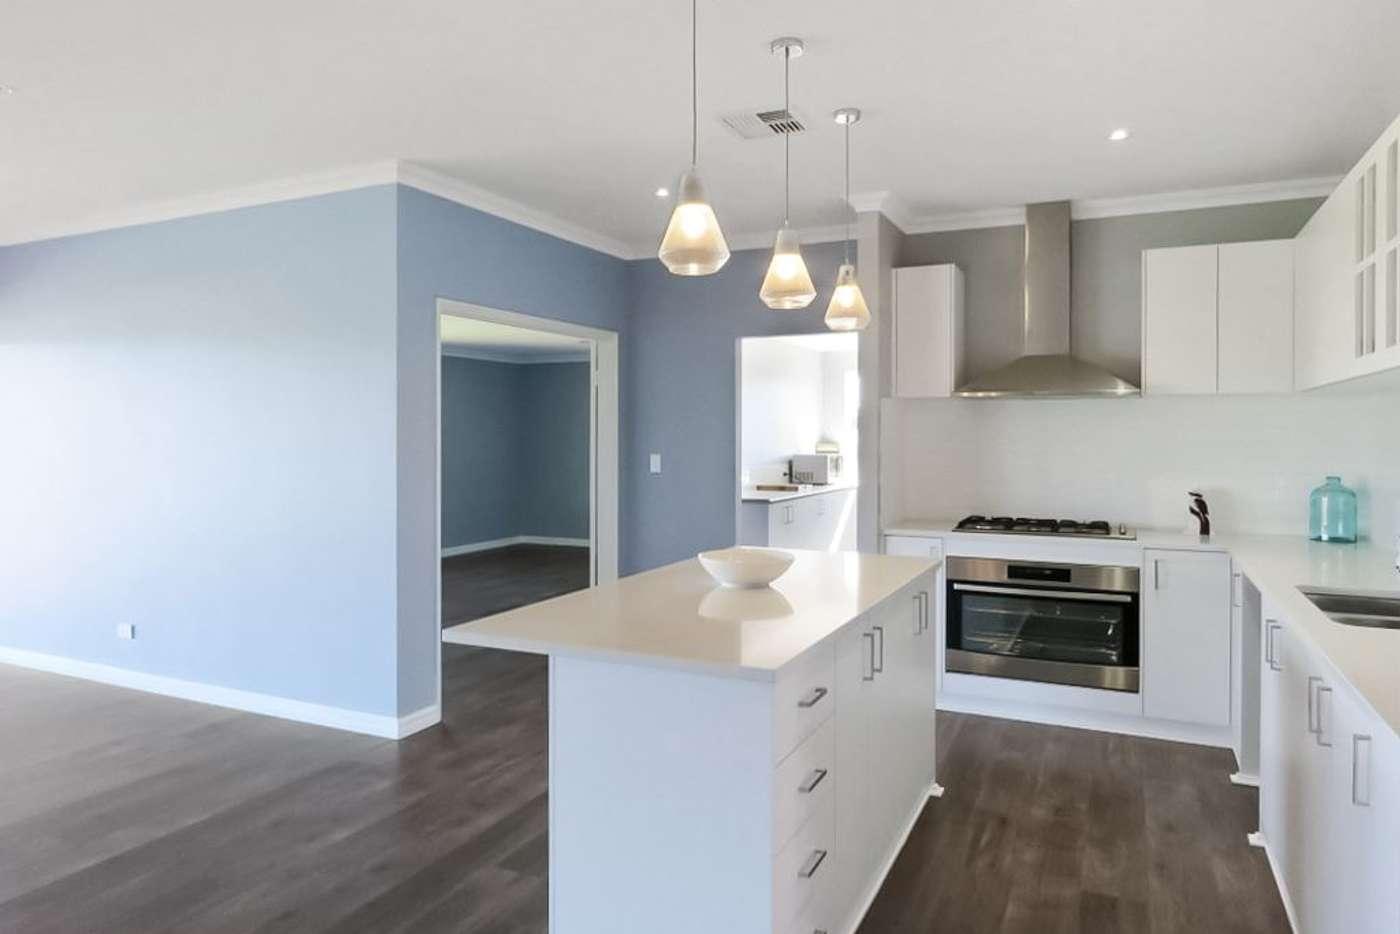 Sixth view of Homely house listing, 31 Robinia Way, Bridgetown WA 6255